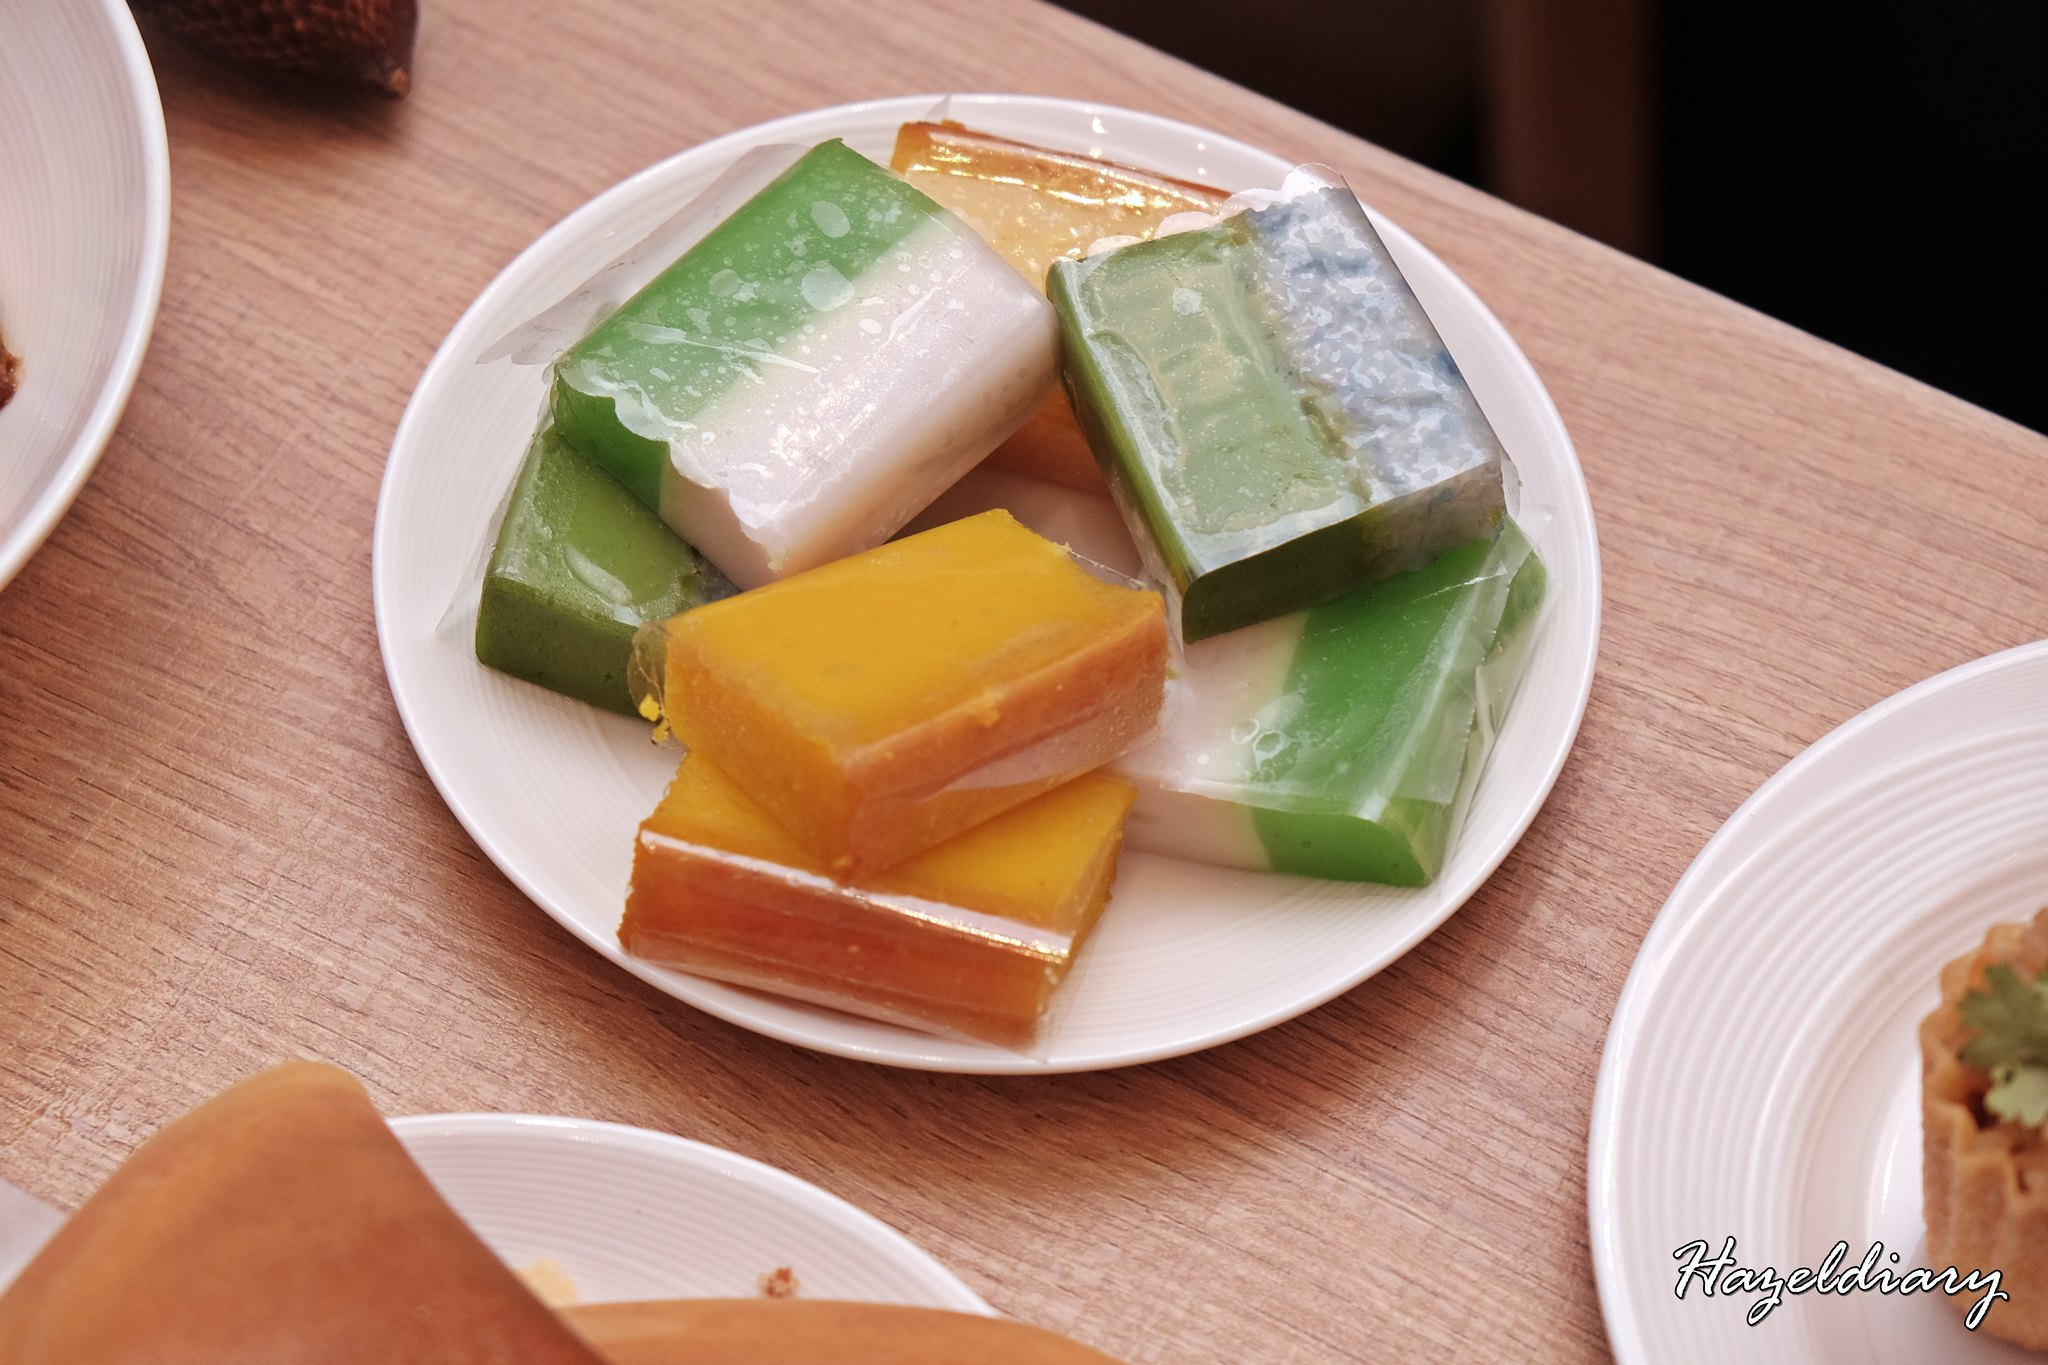 Penang Food Fare Buffet-Sky22 Courtyard Marriott-Kueh